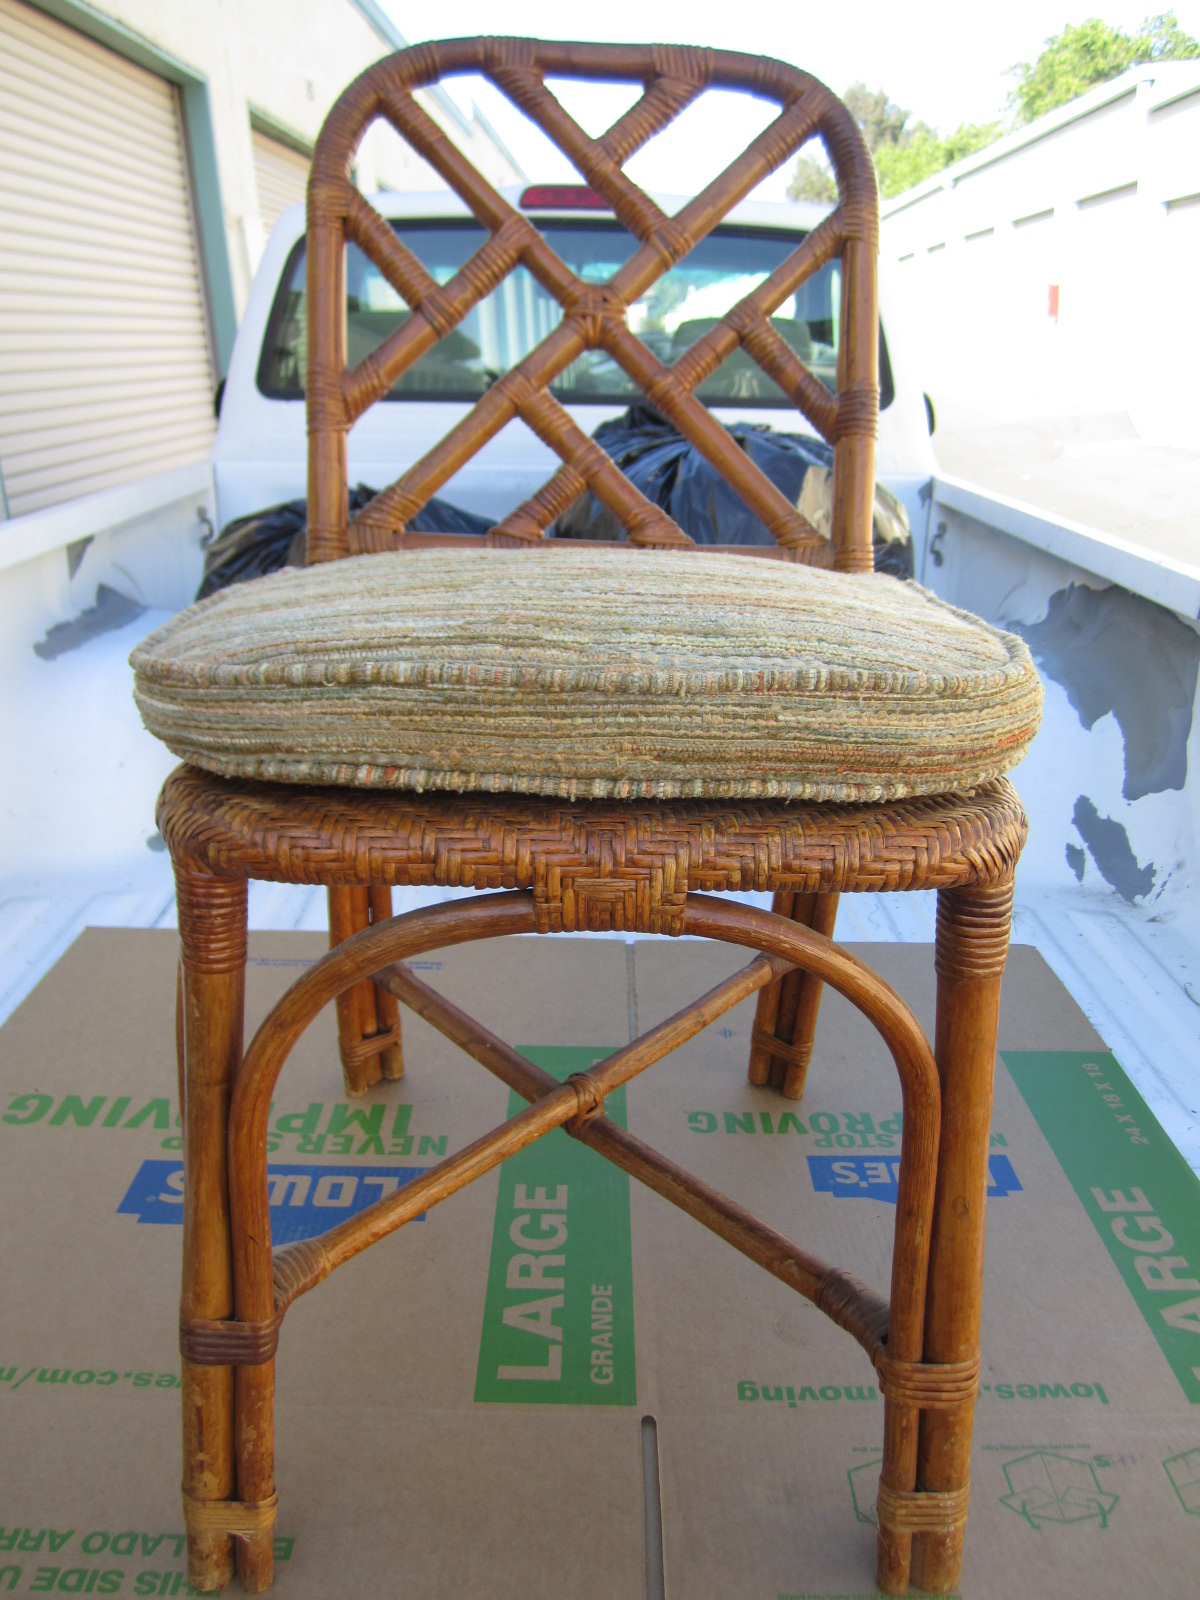 Antique Vintage Bamboo Rattan Wicker Dining Chair Antique Appraisal Instappraisal